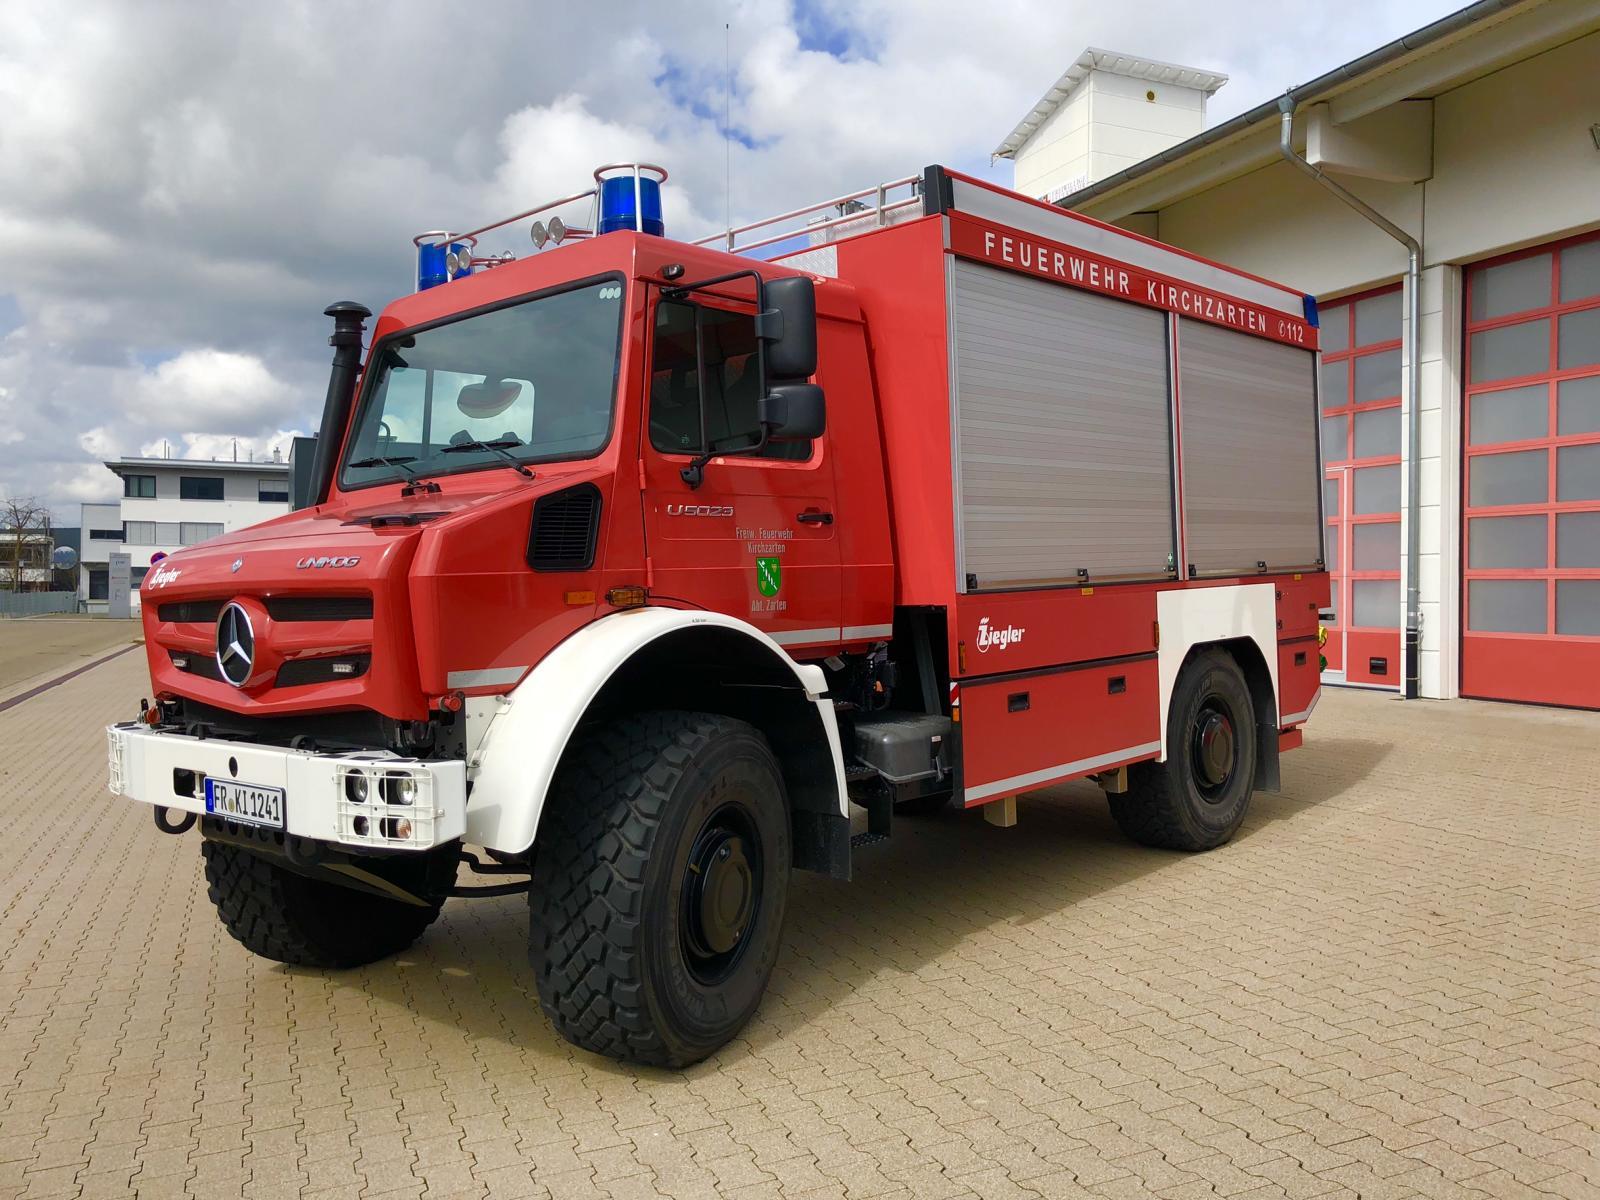 TLF4000